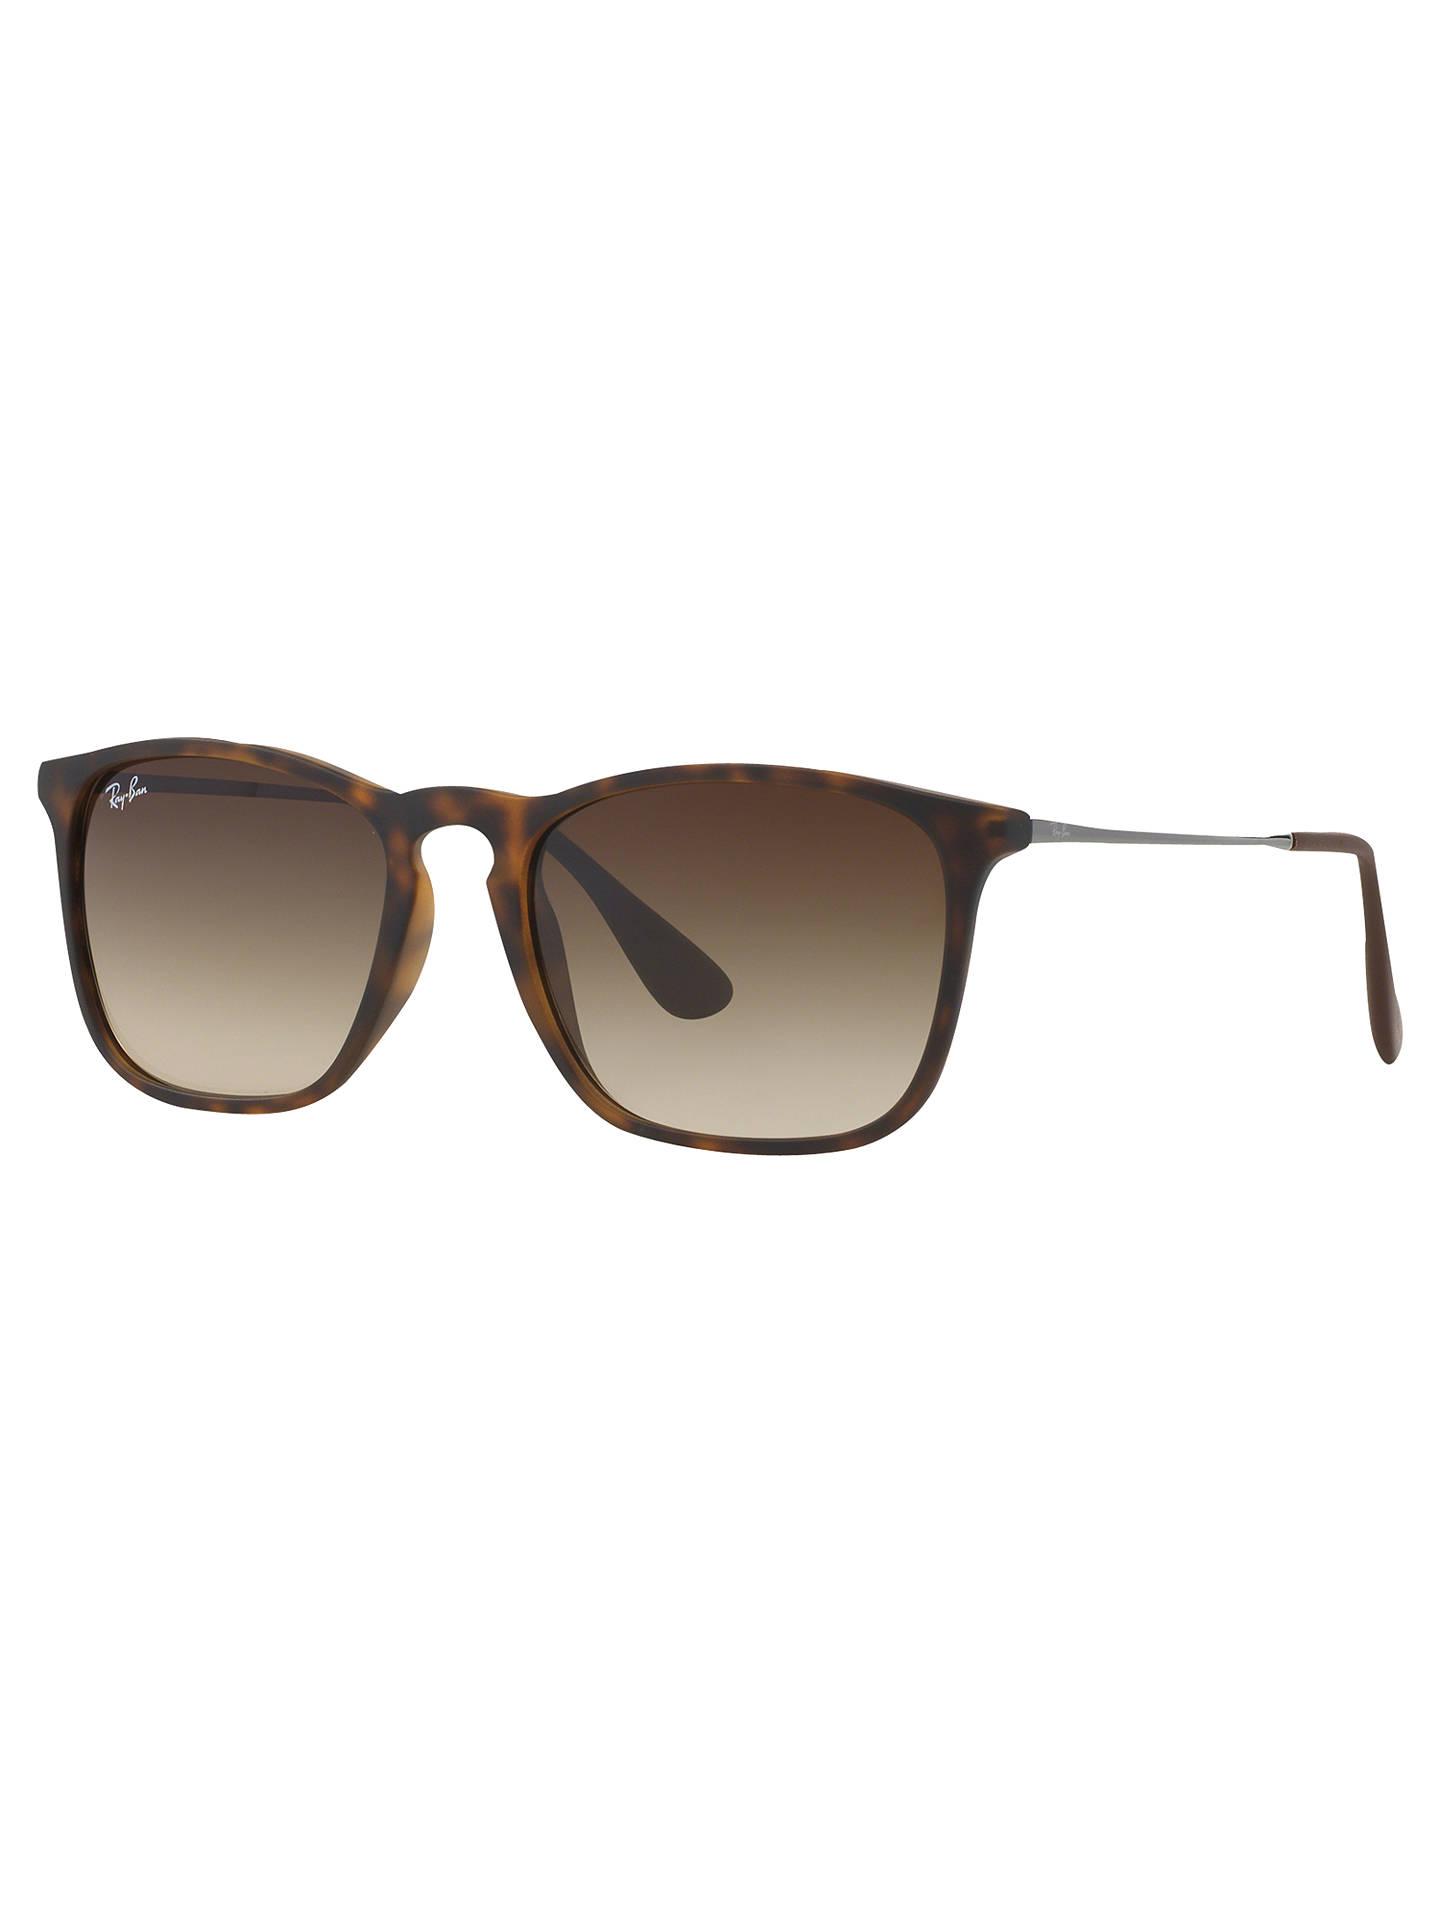 1b60ba86fdbb6 Ray-Ban RB4187 Chris Square Sunglasses at John Lewis   Partners